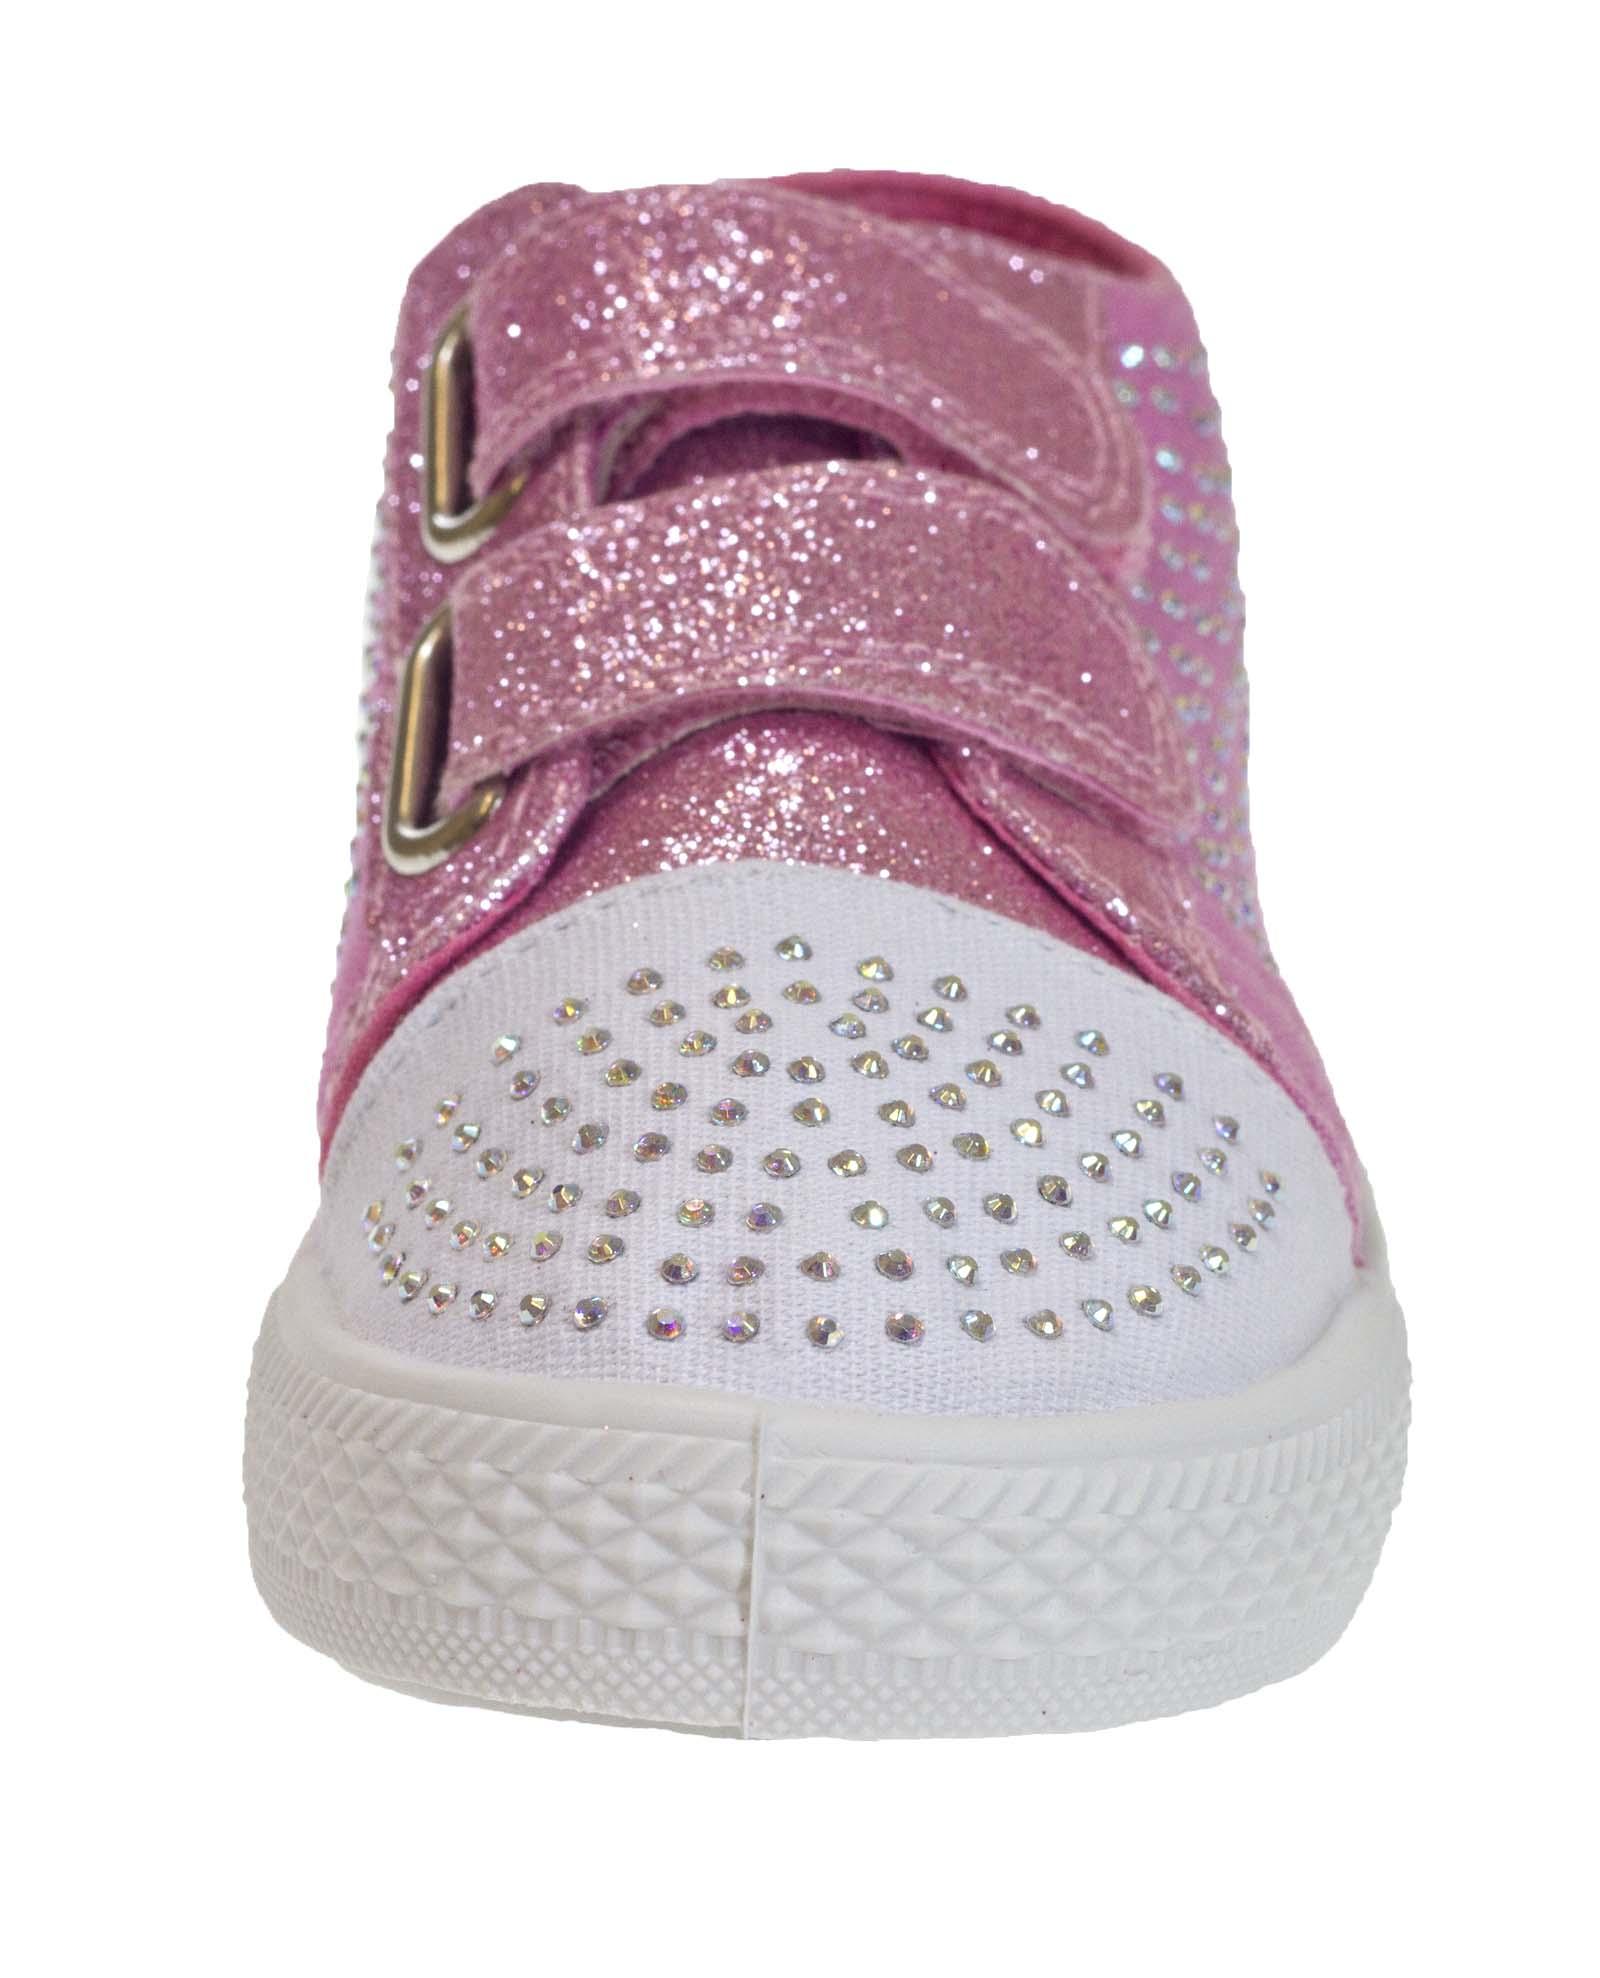 Kids Girls Glitter Pumps Sequin Shoes Canvas Pumps Skate